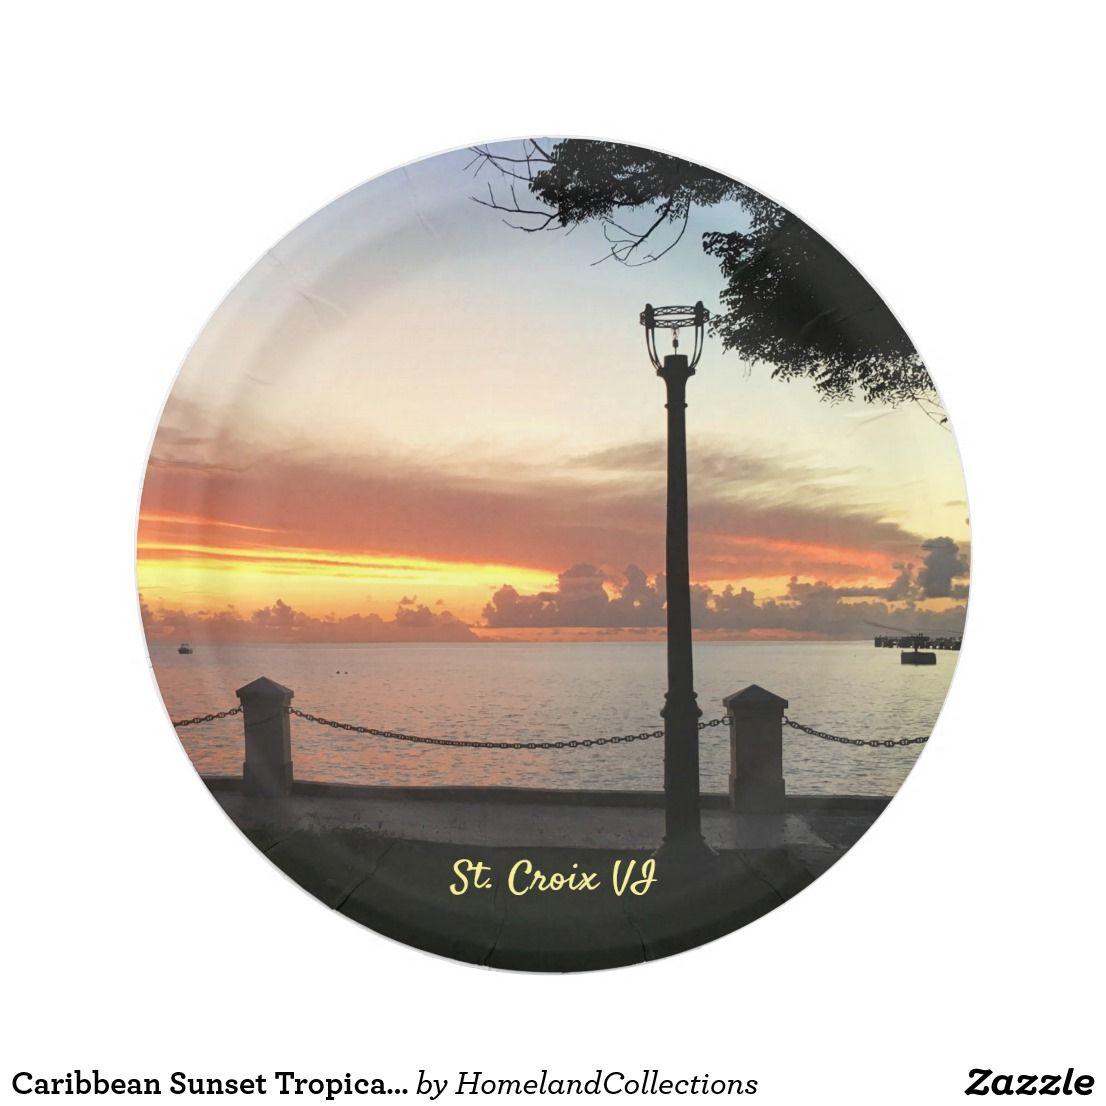 Caribbean Sunset Tropical Personalize Paper Plate Zazzle Com Caribbean Island Theme Caribbean Gift